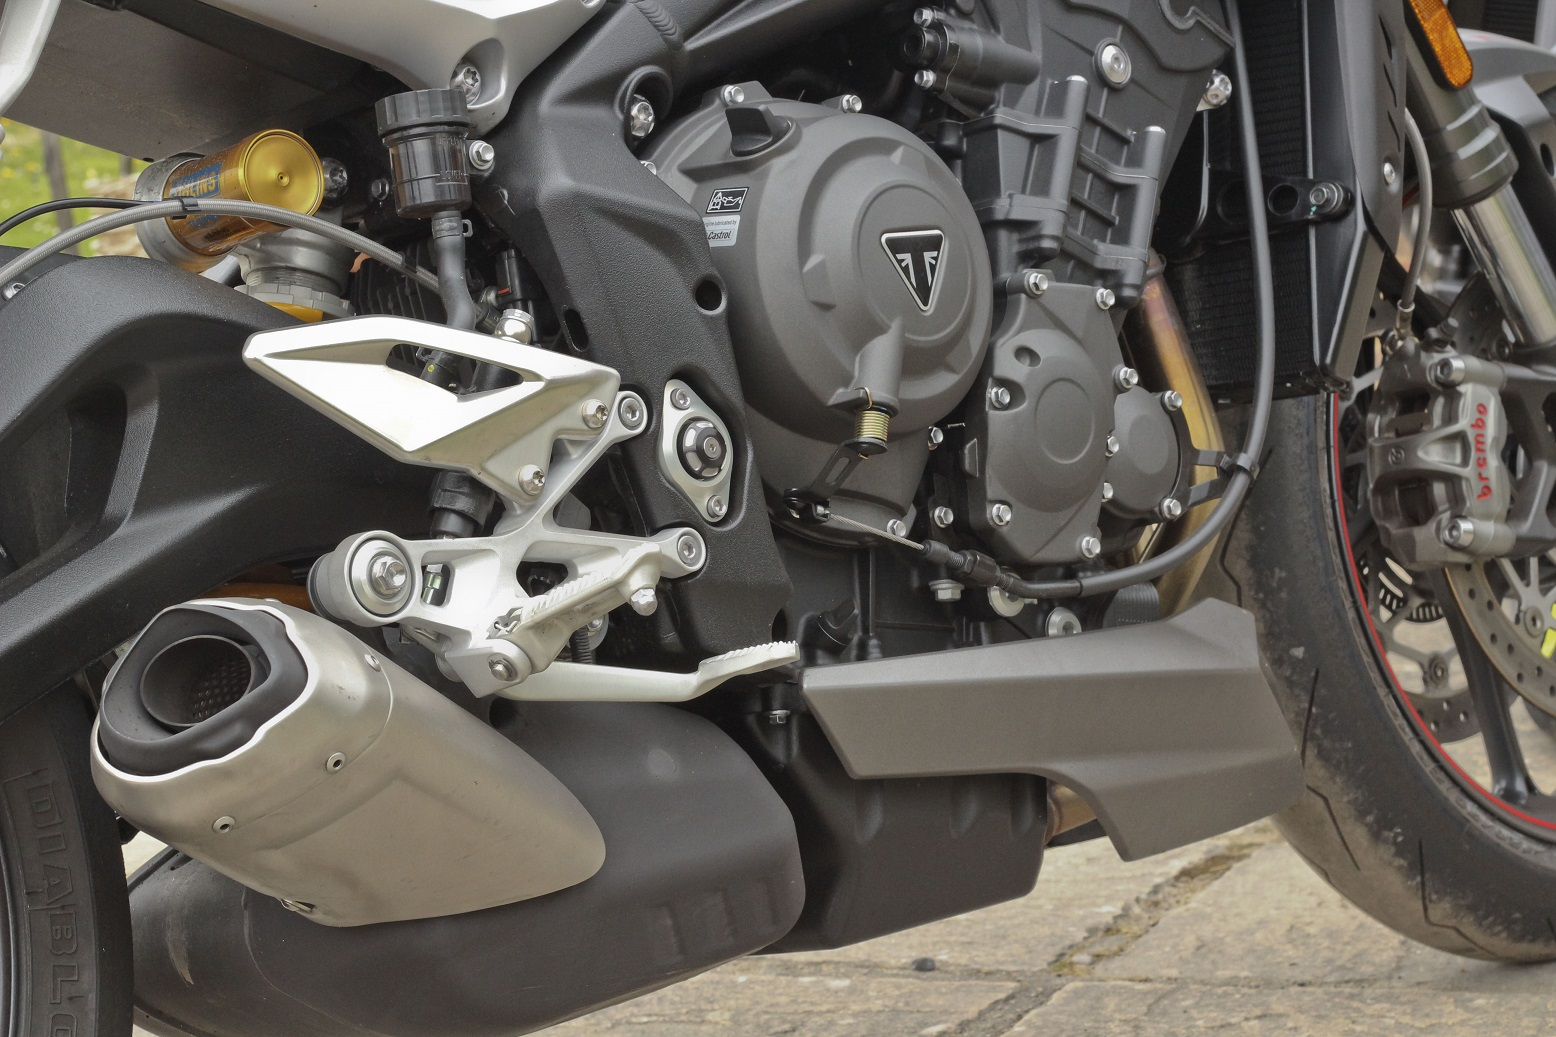 Triumph Street Triple 765 RS engine